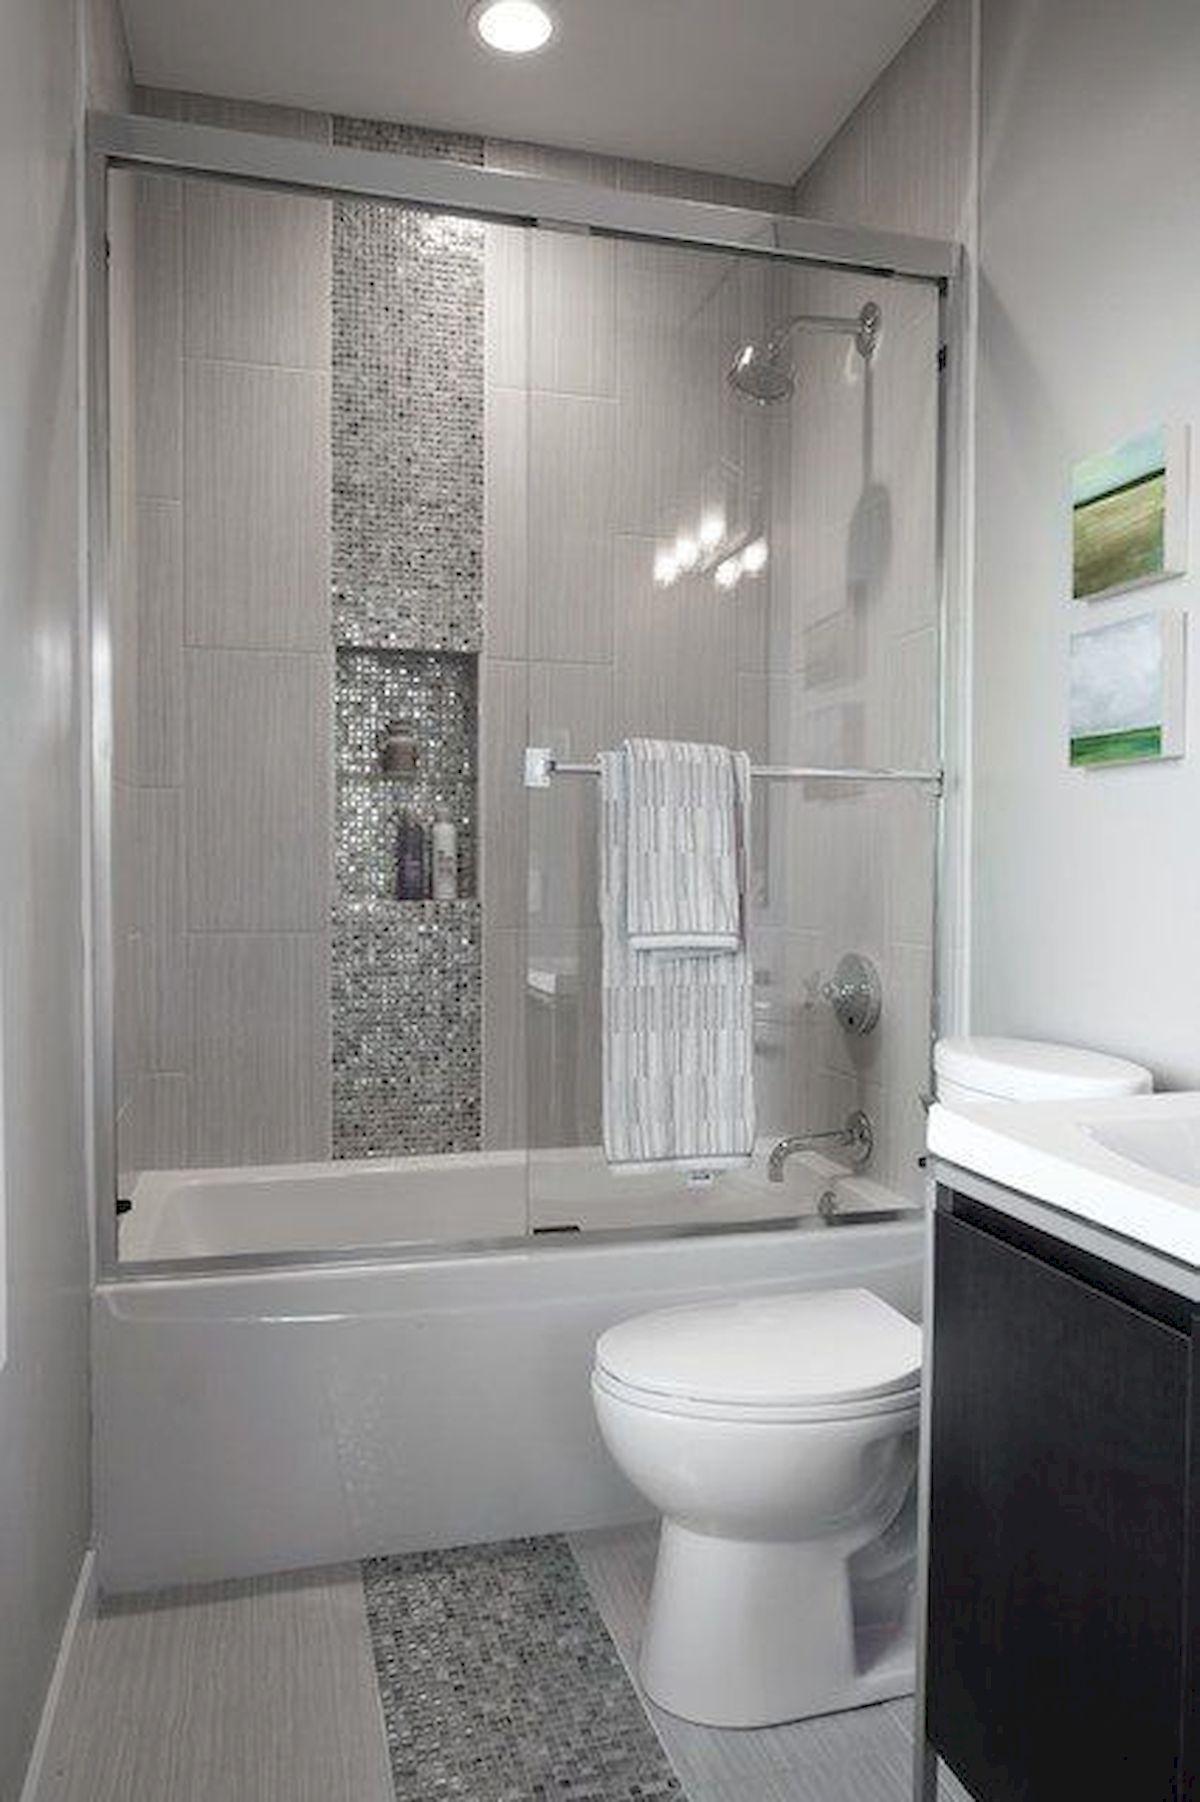 60 Elegant Small Master Bathroom Remodel Ideas 20 Bathroom